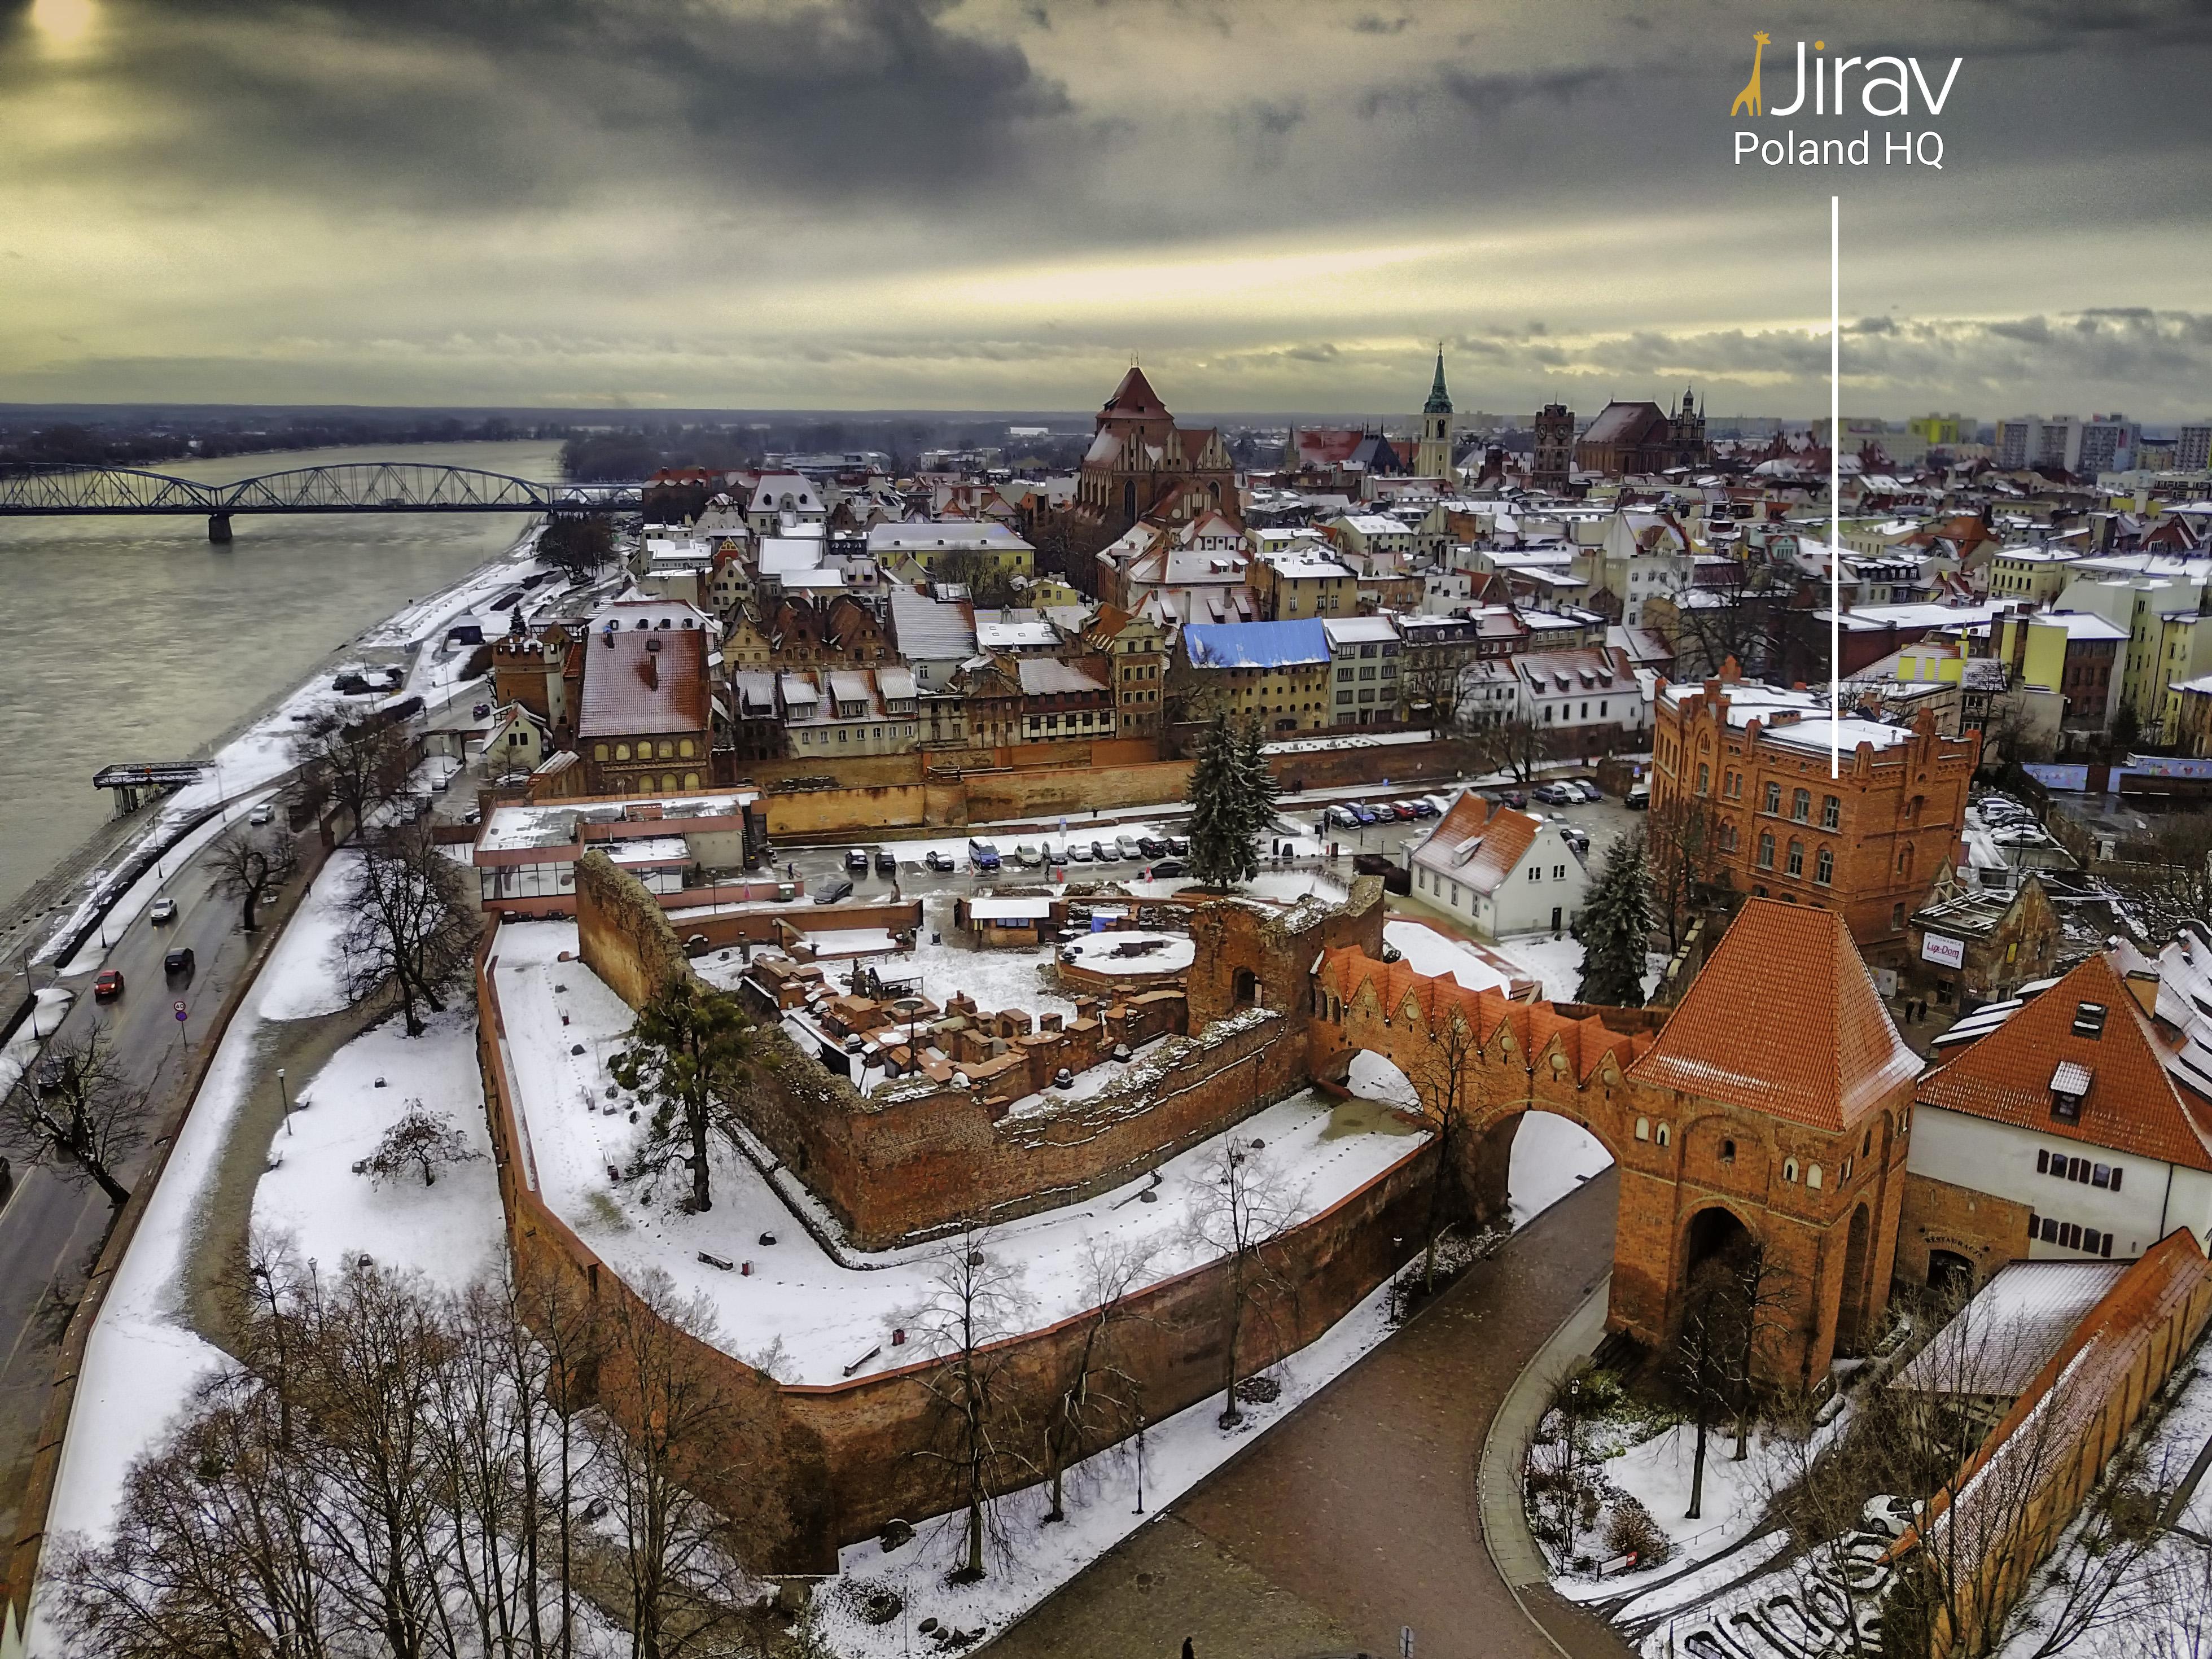 Jirav-Poland-HQ.jpg